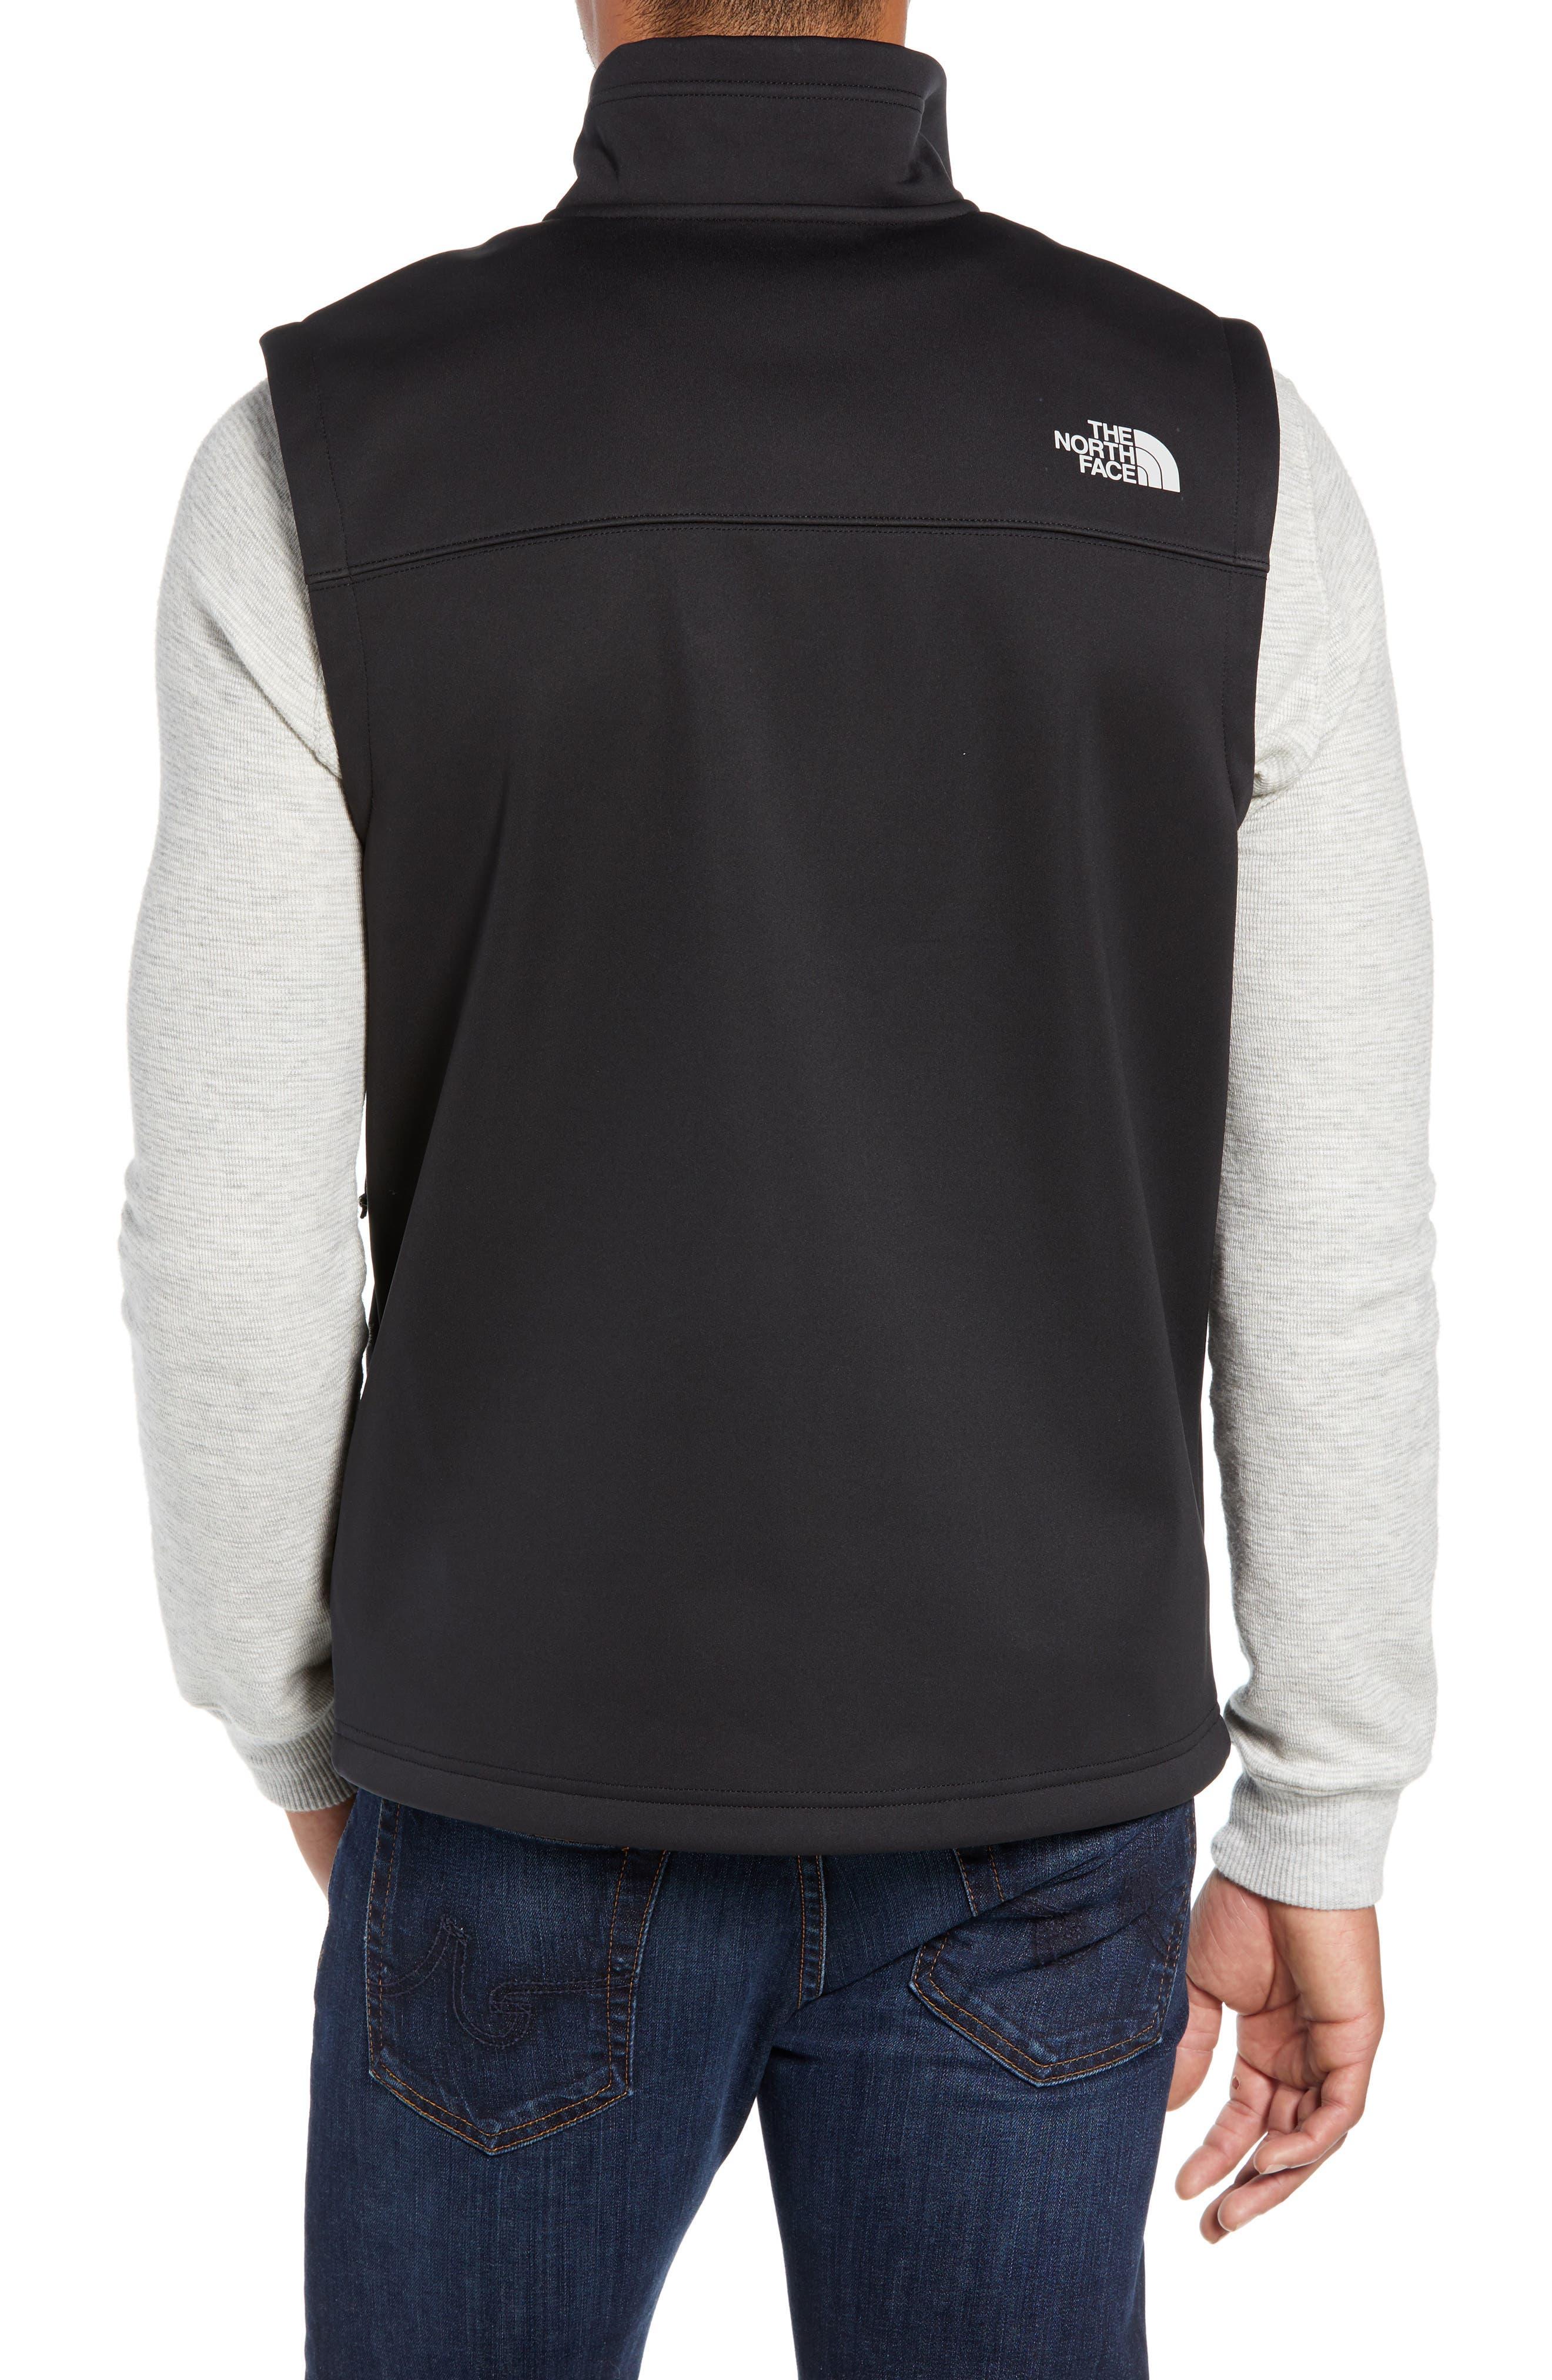 Apex Risor Vest,                             Alternate thumbnail 2, color,                             TNF BLACK/ TNF BLACK